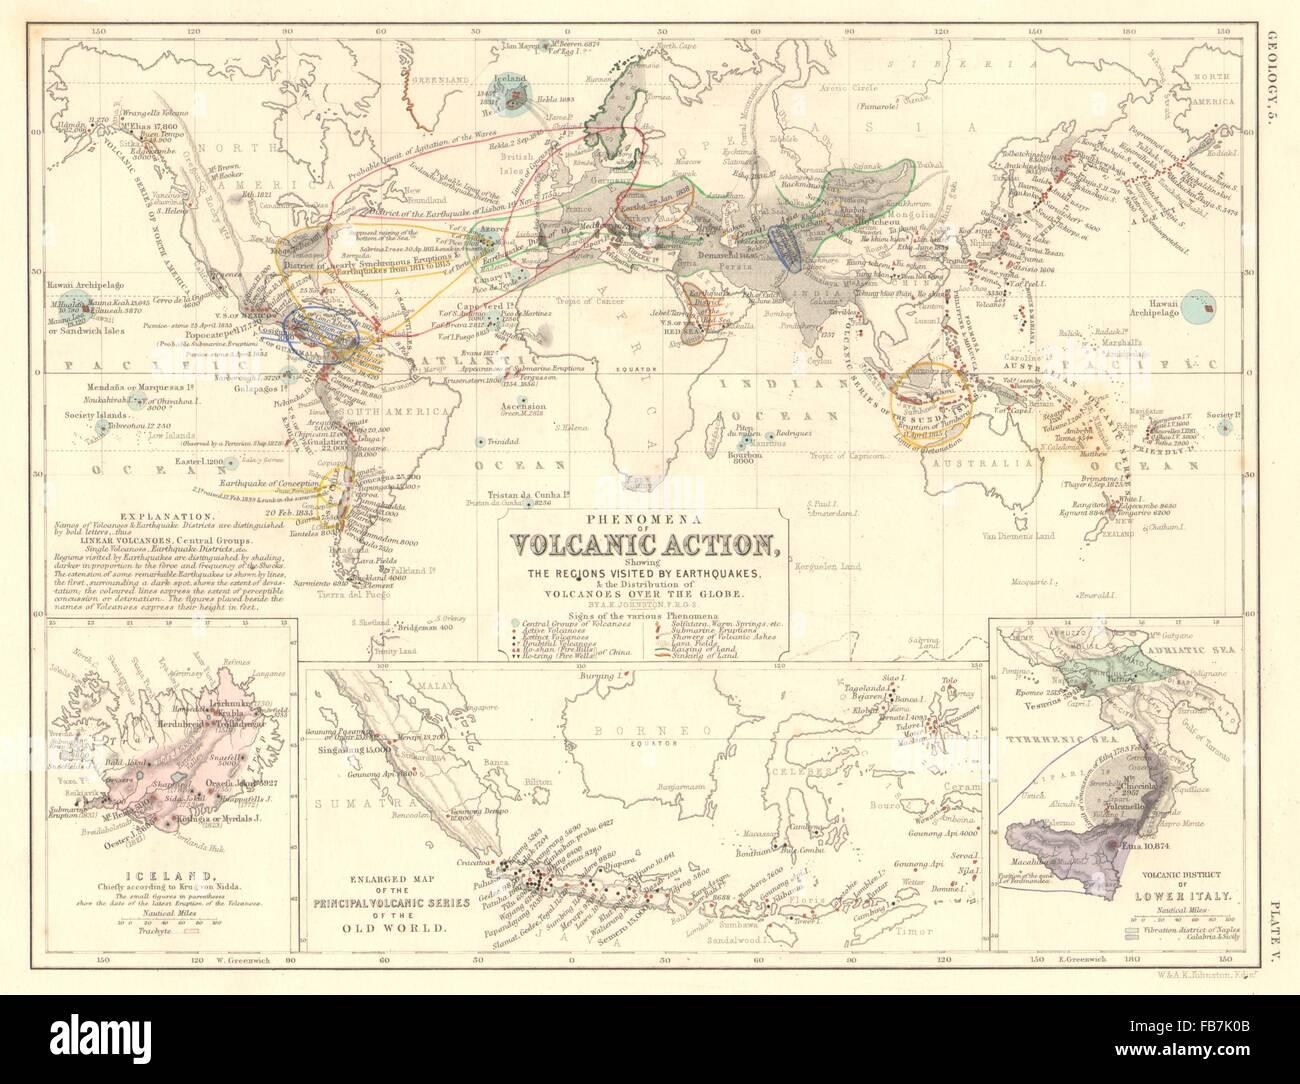 World volcanoesvolcanic action earthquakesiceland indonesia world volcanoesvolcanic action earthquakesiceland indonesia italy 1850 map gumiabroncs Gallery